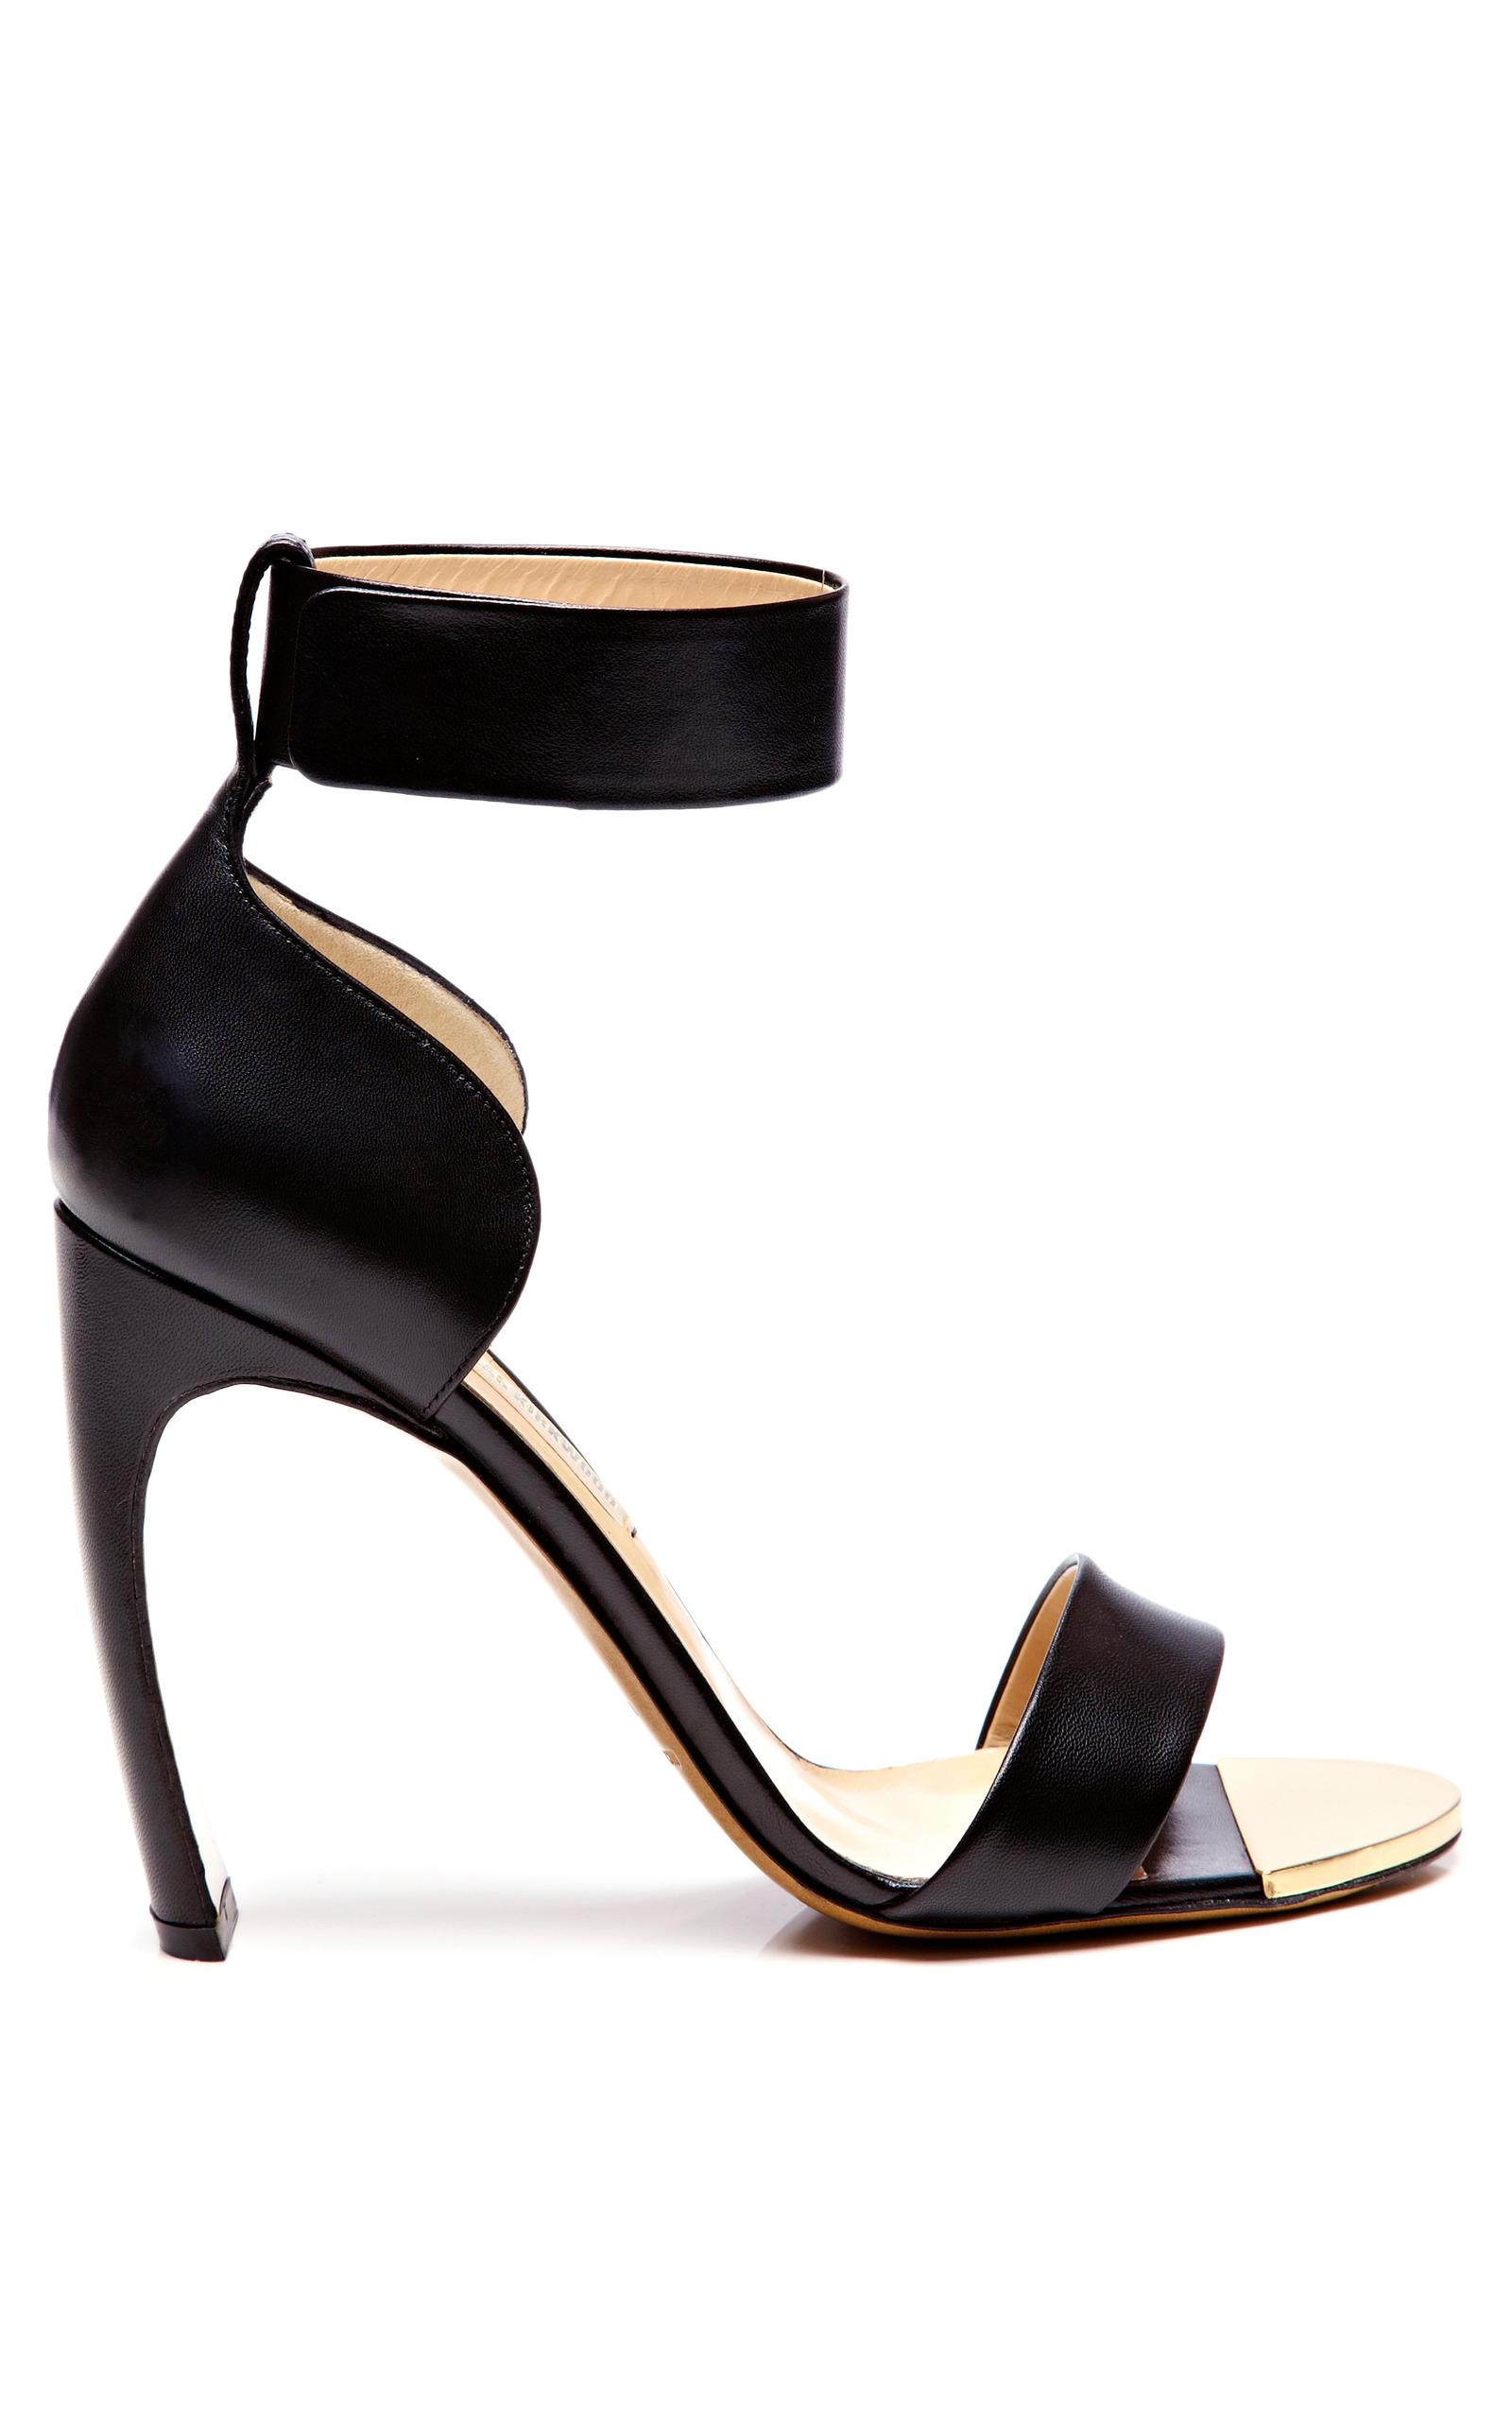 6d2692c42ba Nicholas KirkwoodBlack Kid Ankle-Strap Sandal with Curved Heel. CLOSE.  Loading